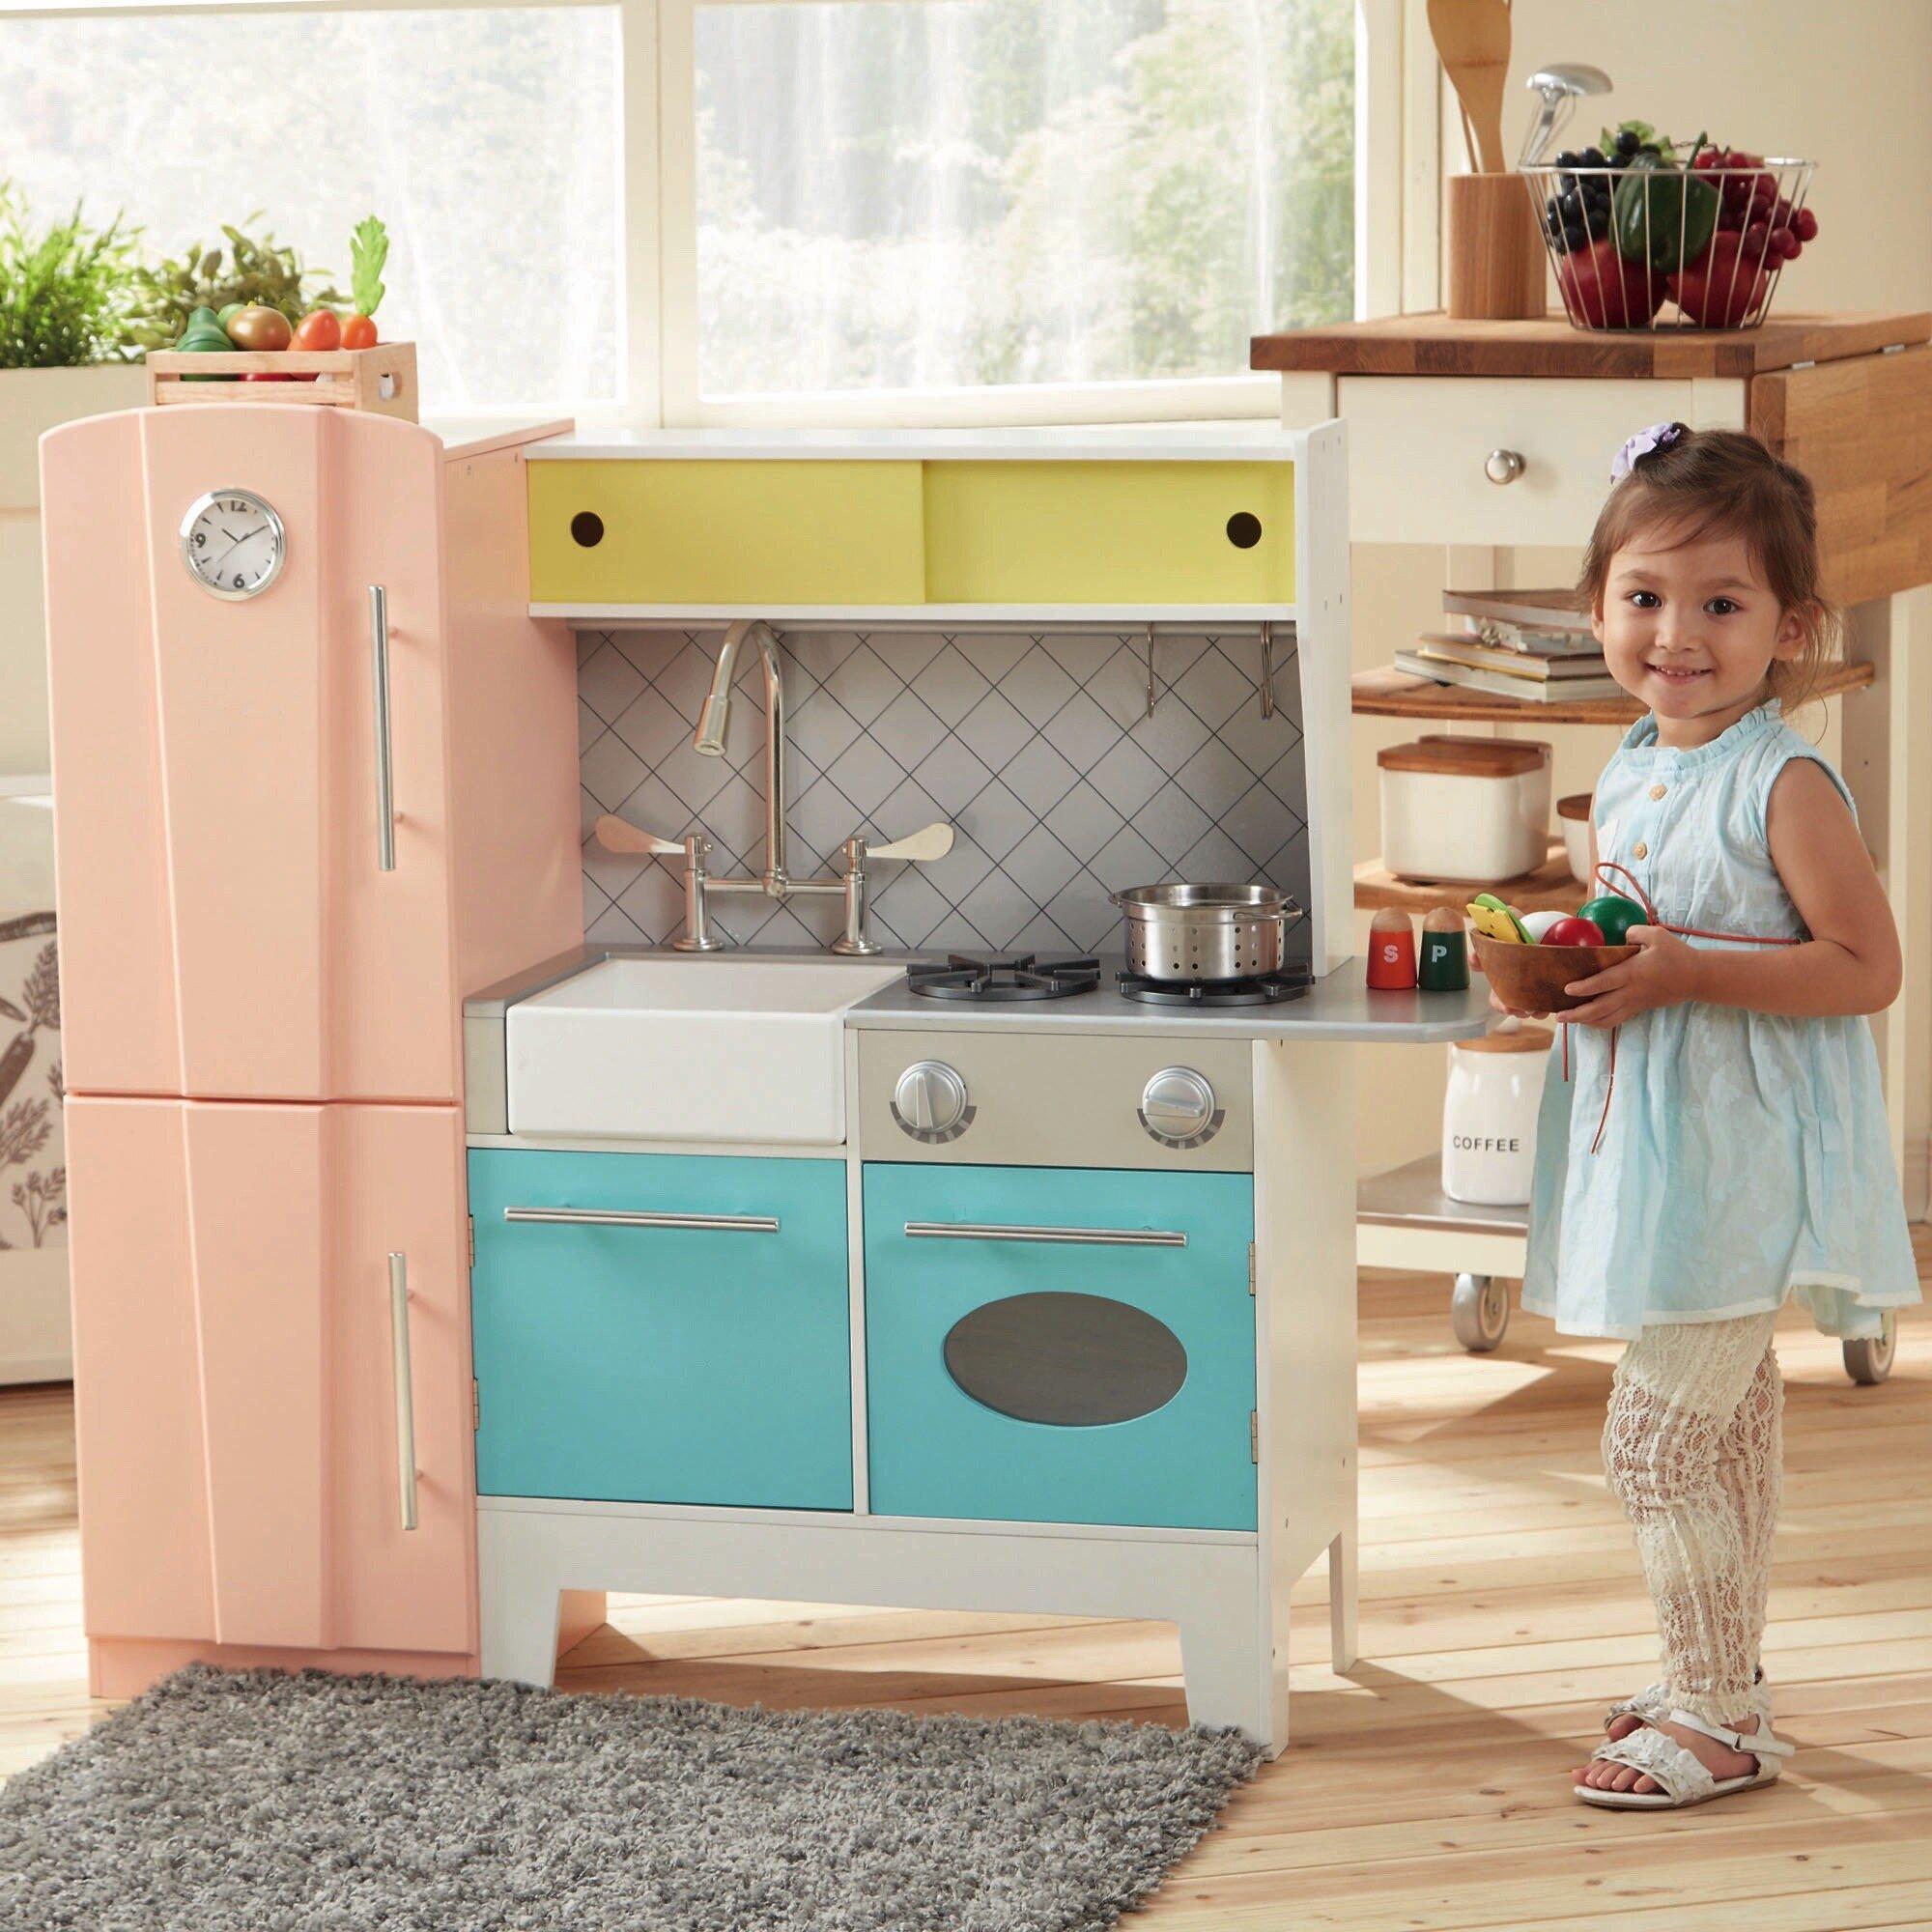 Teamson Kids Playful Bubble Gum Wooden Play Kitchen Reviews Wayfair